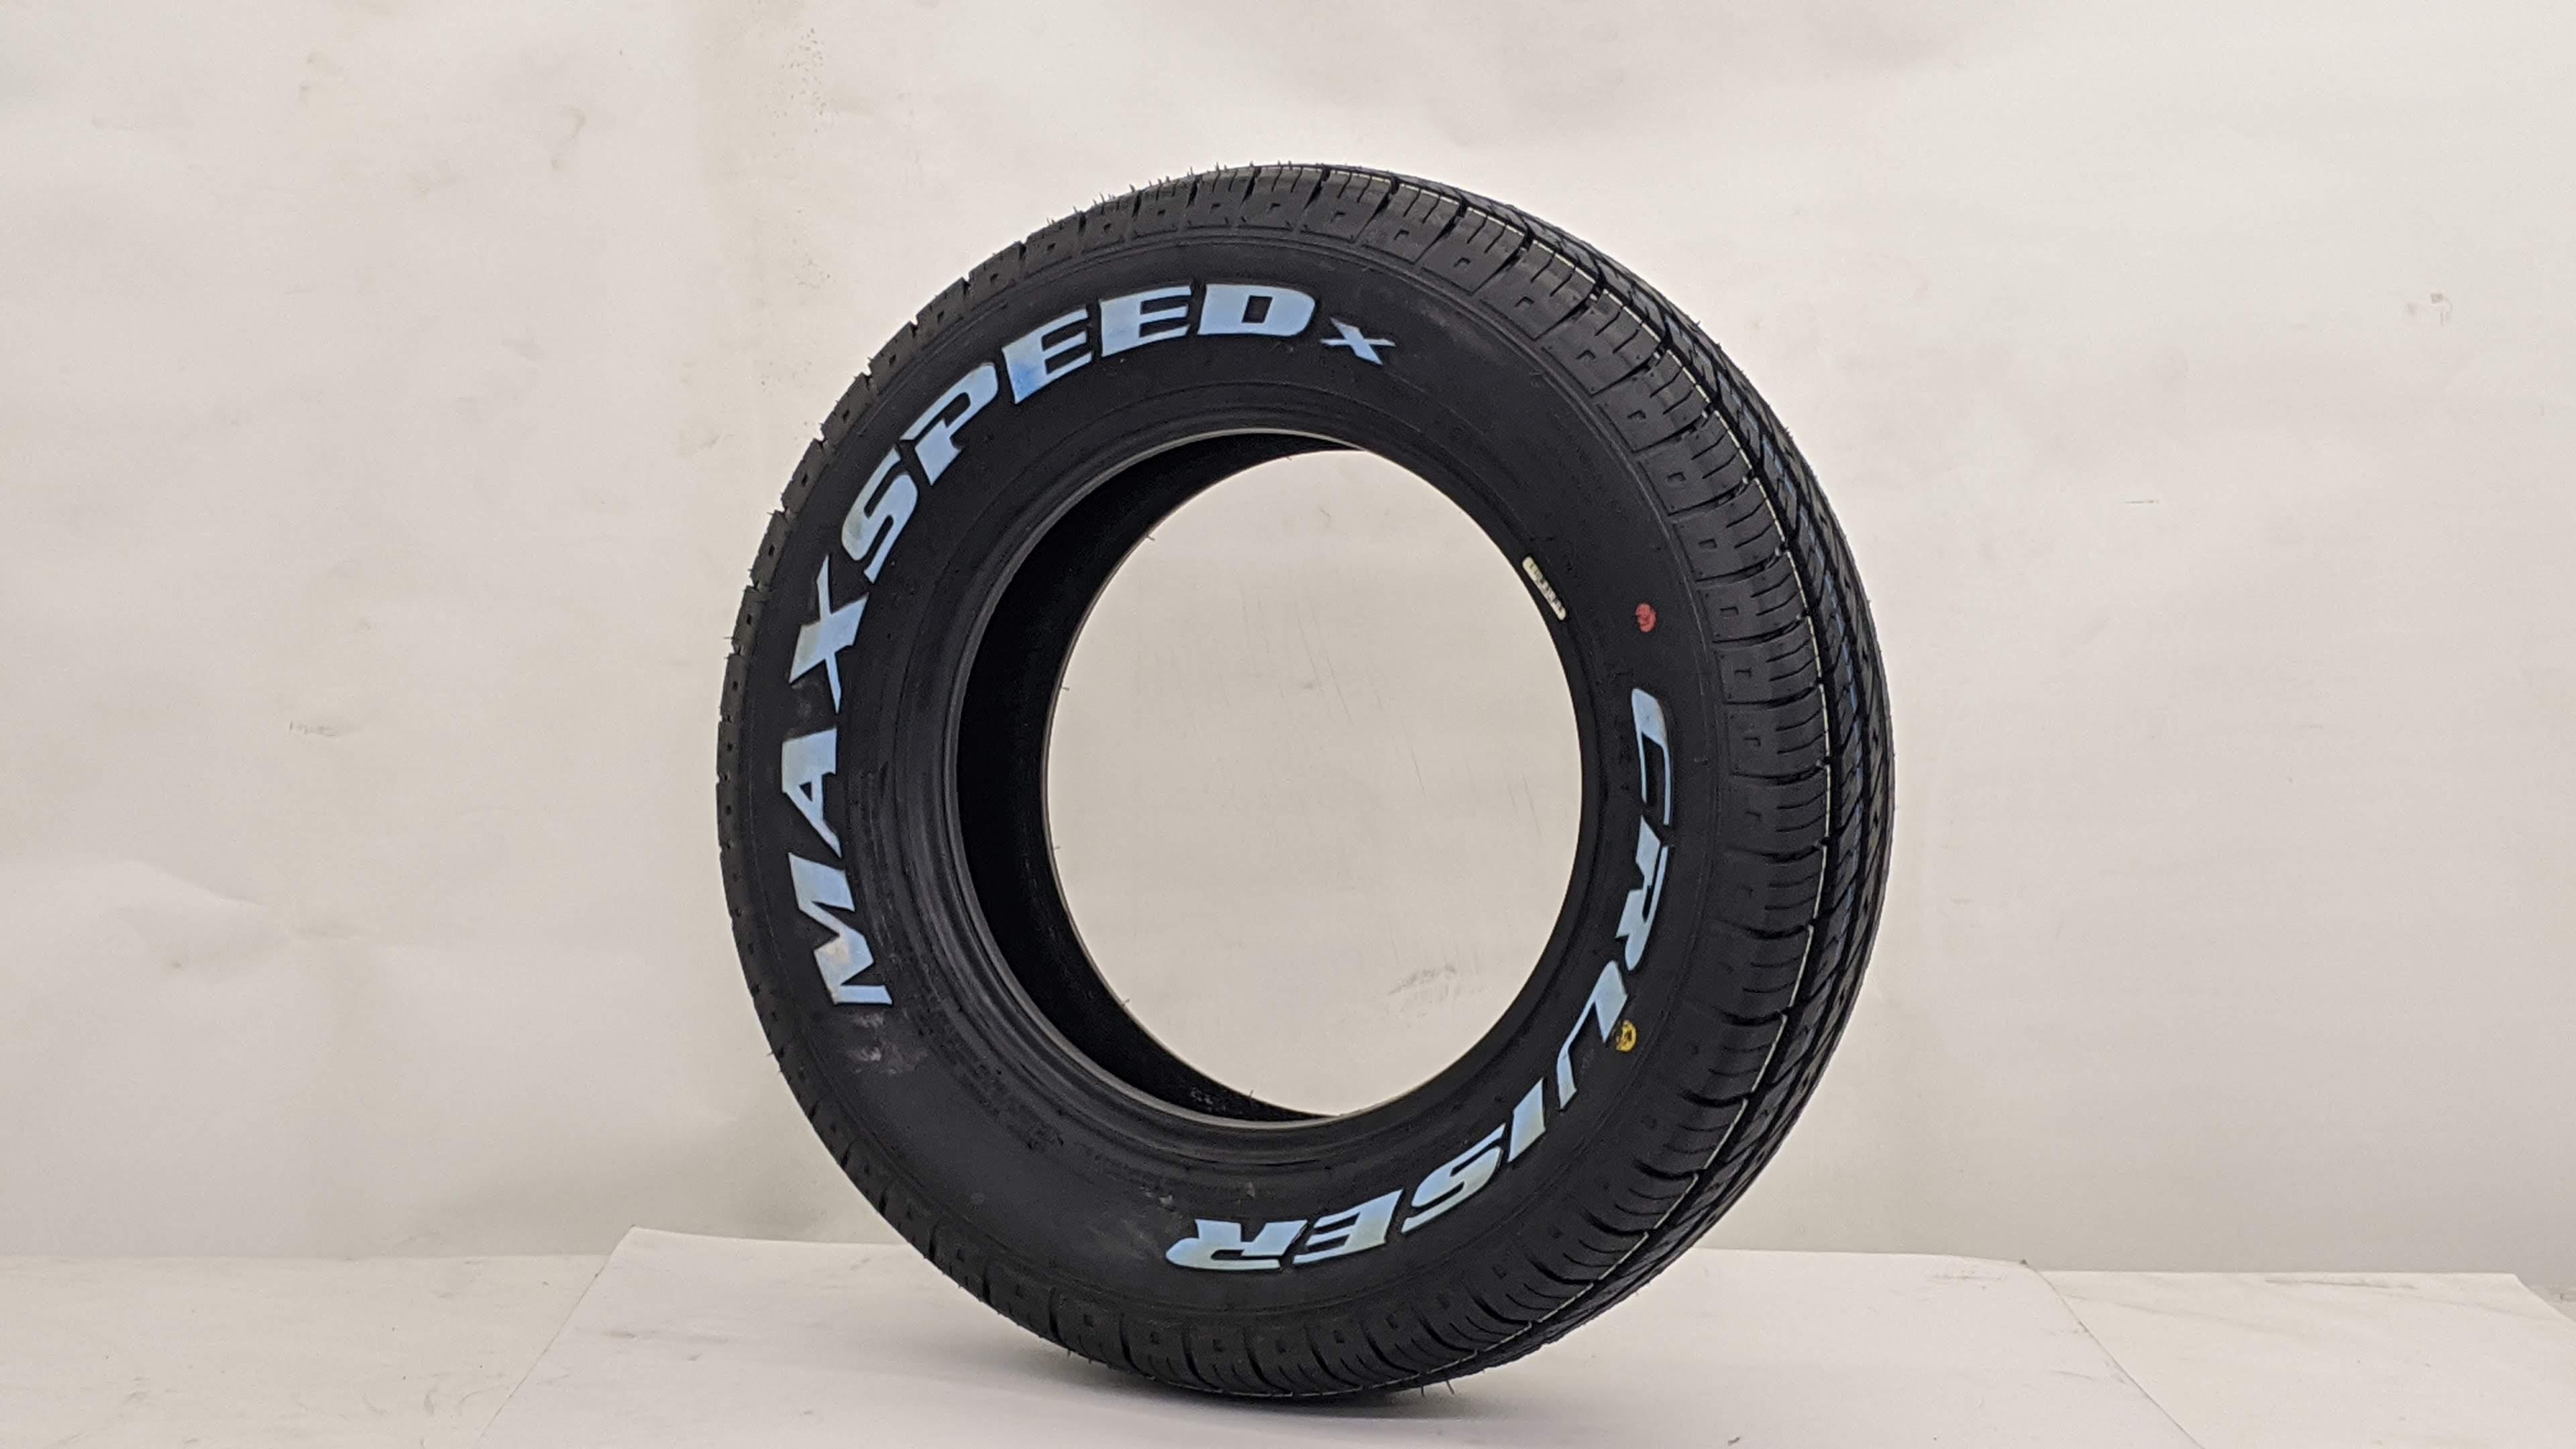 CRUISER Tires Maxspeed X Tire